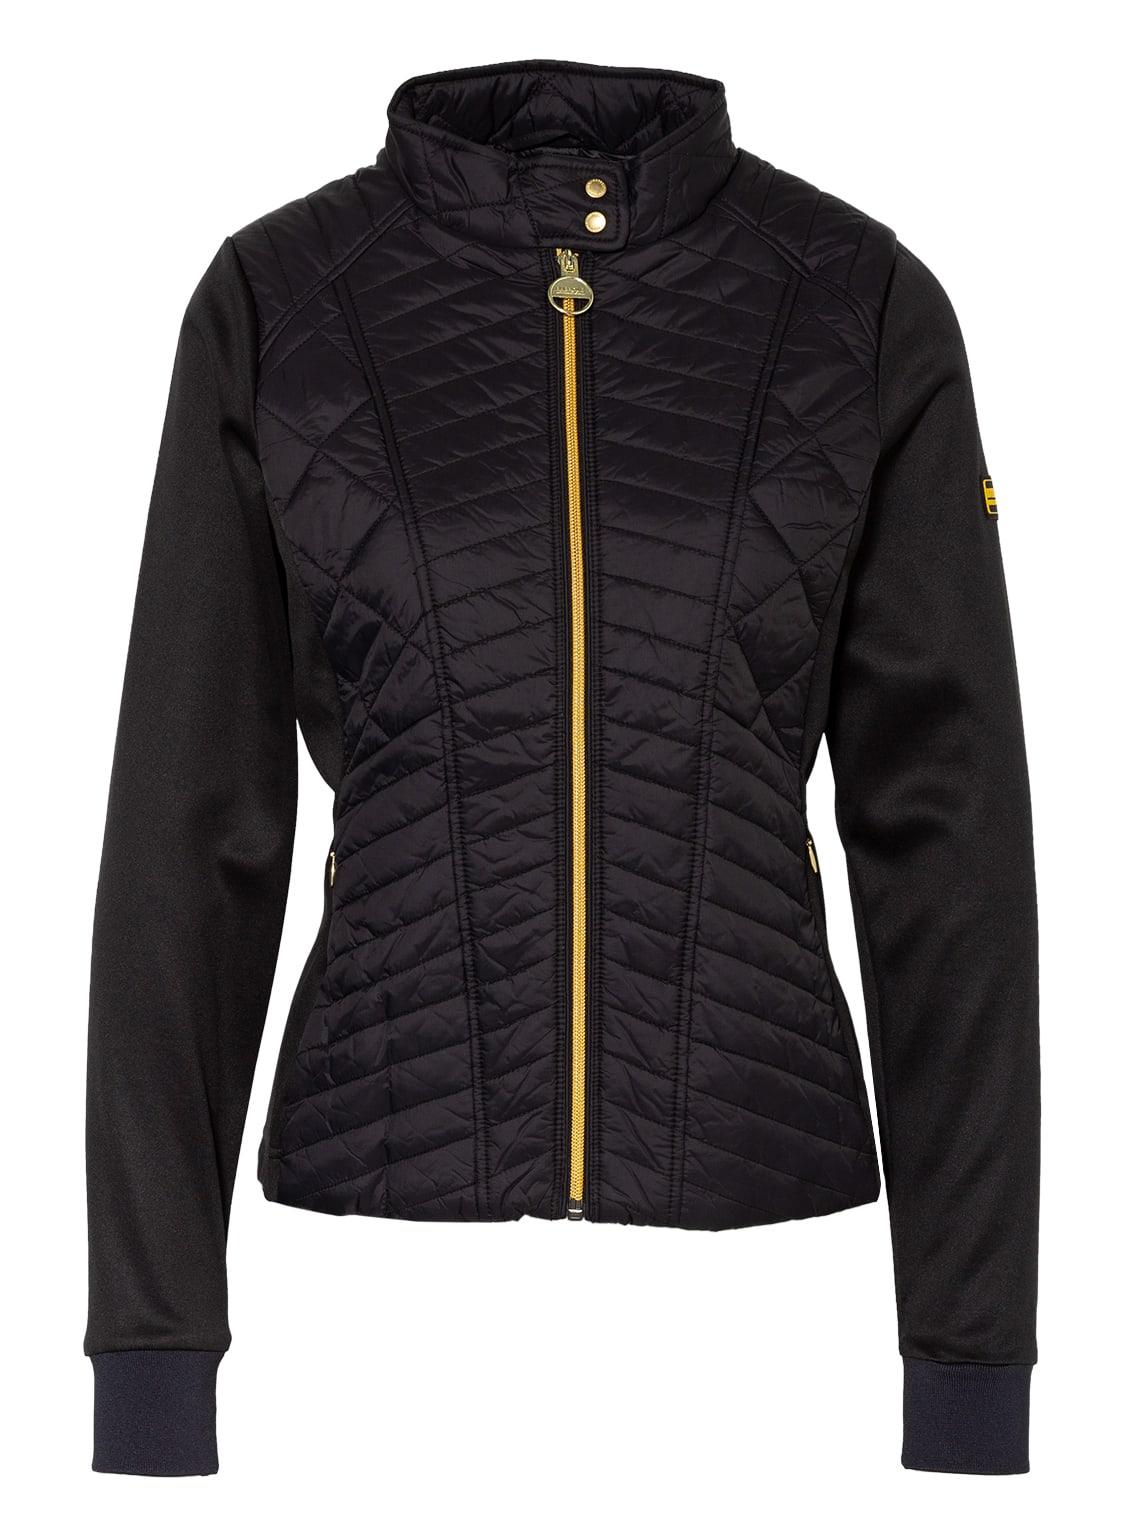 Image of Barbour International Jacke Im Materialmix schwarz